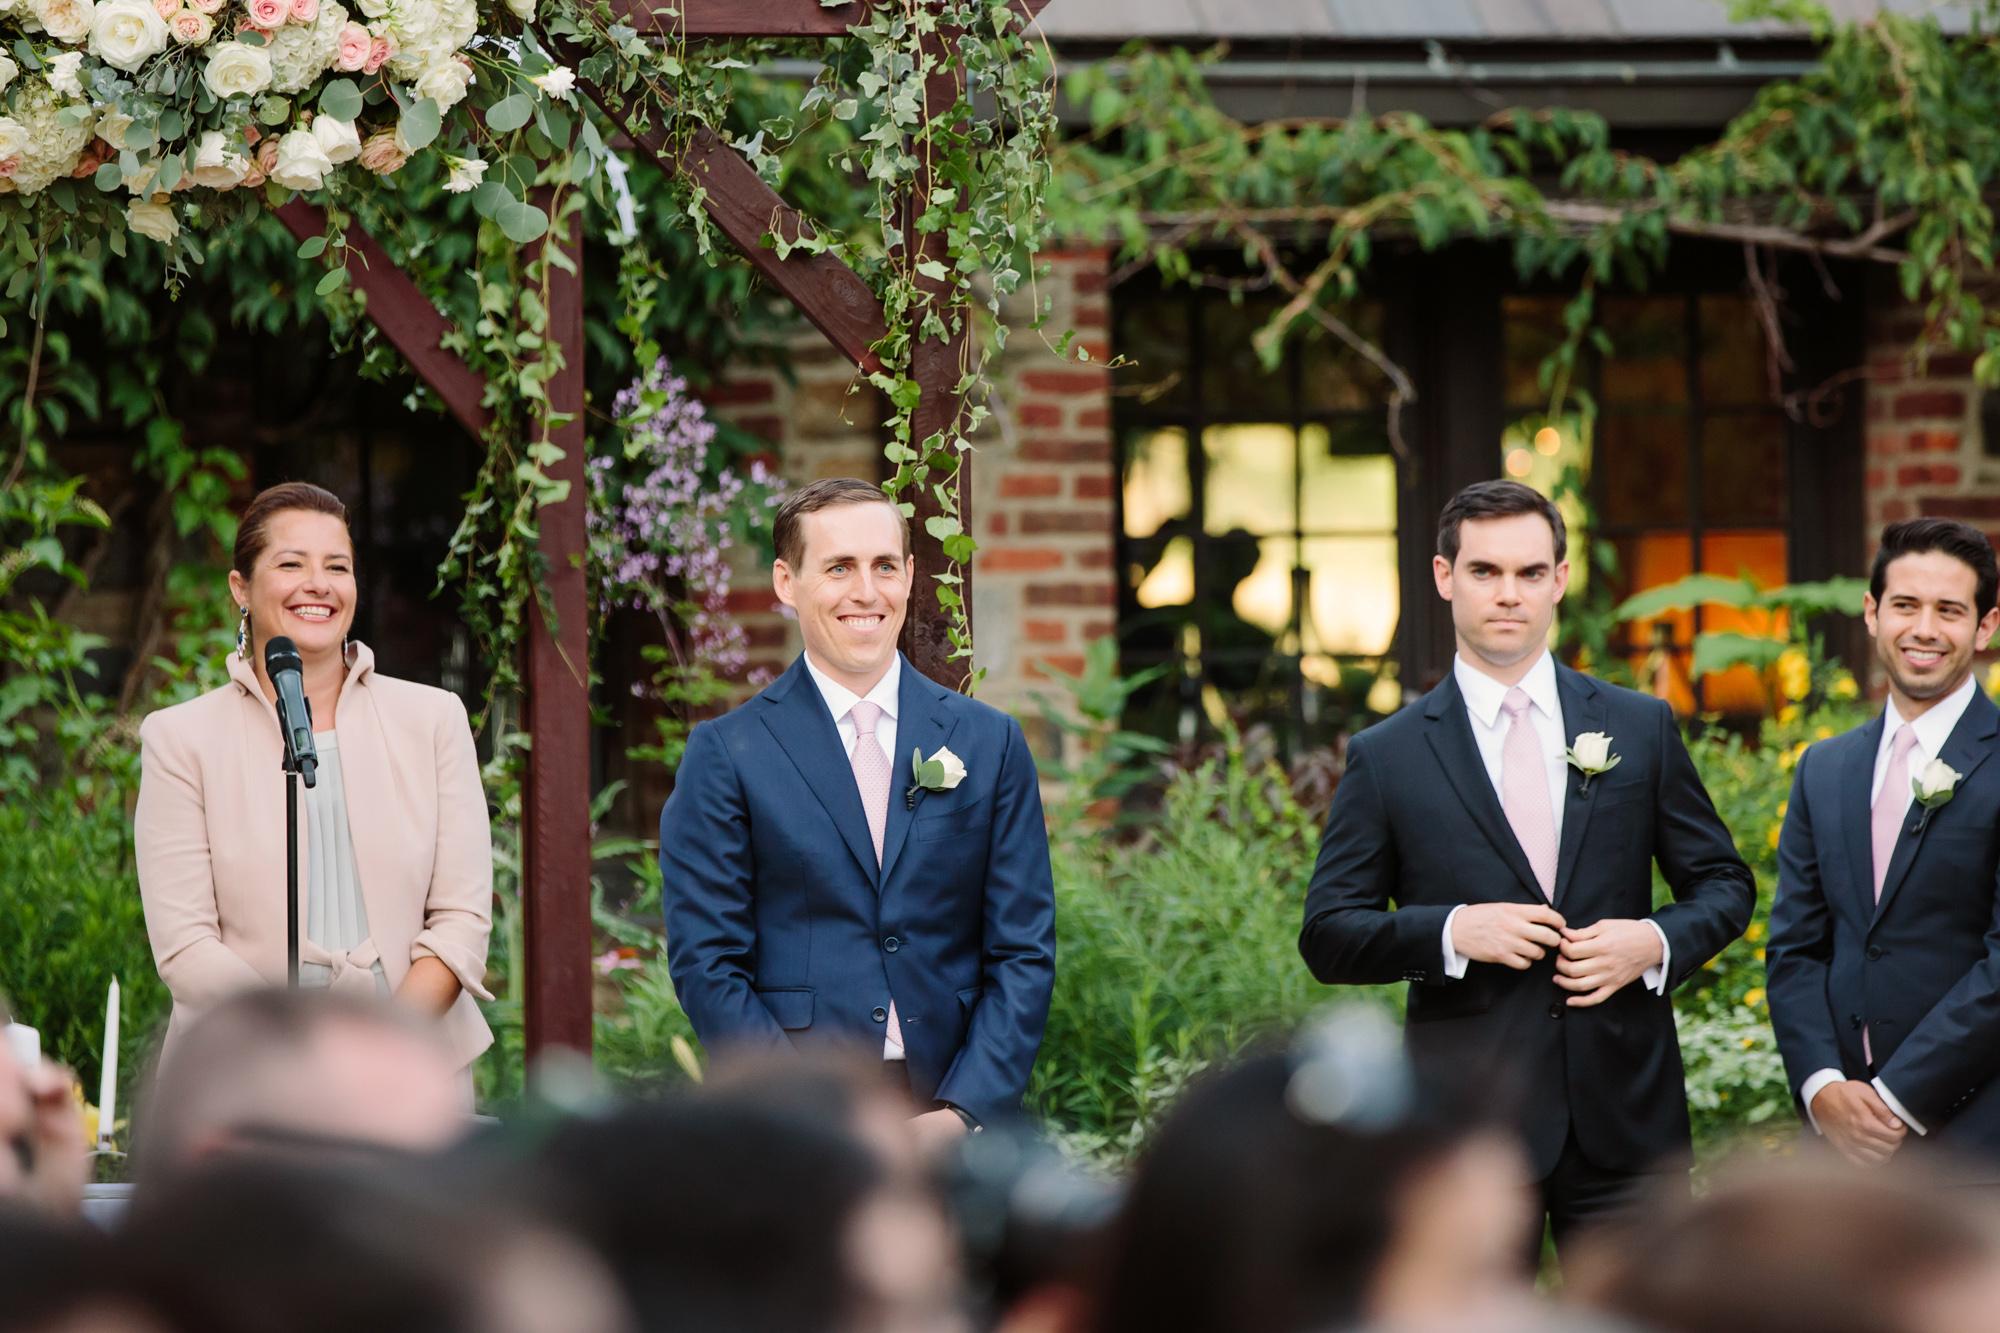 40_Jessica_Ted_Blue_Hill_Stone_Barns_Wedding_Pocantico_NY_Tanya_Salazar_Photography_115.jpg